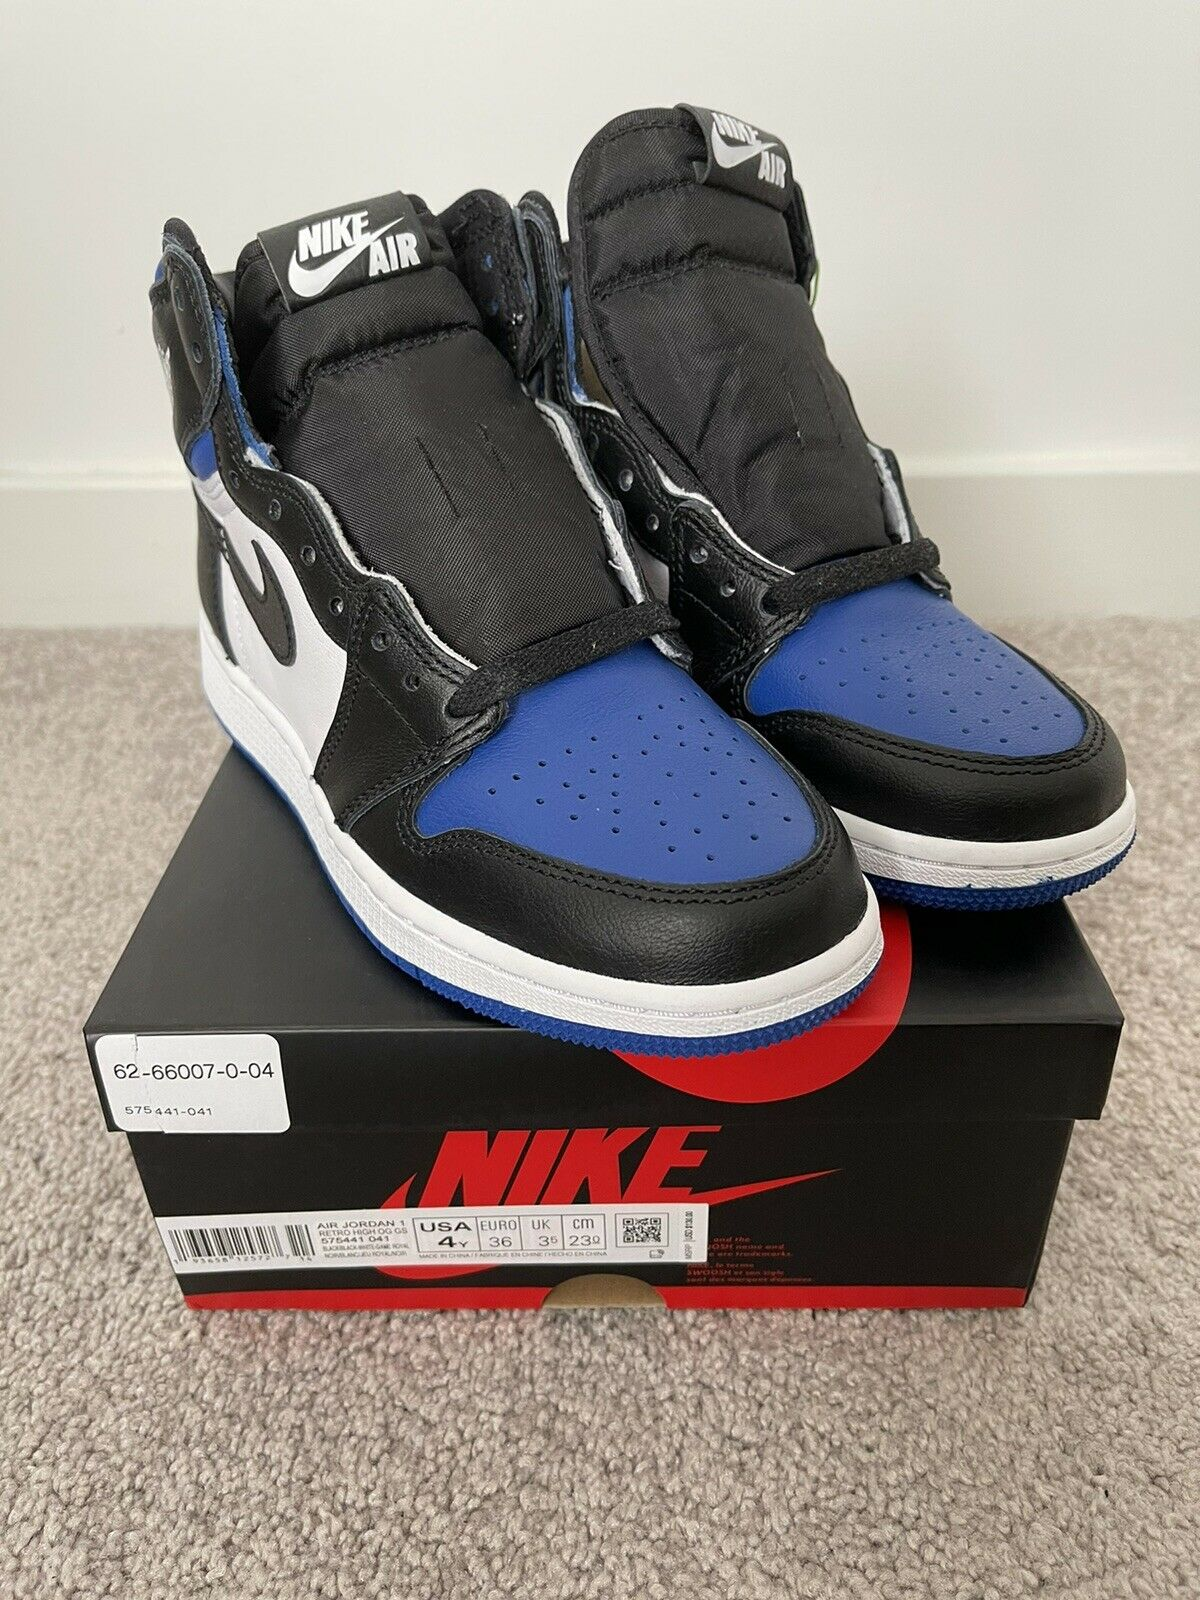 Jordan 1 Retro High OG Royal Toe (GS) 575441-041 Size 4Y Women's 5.5